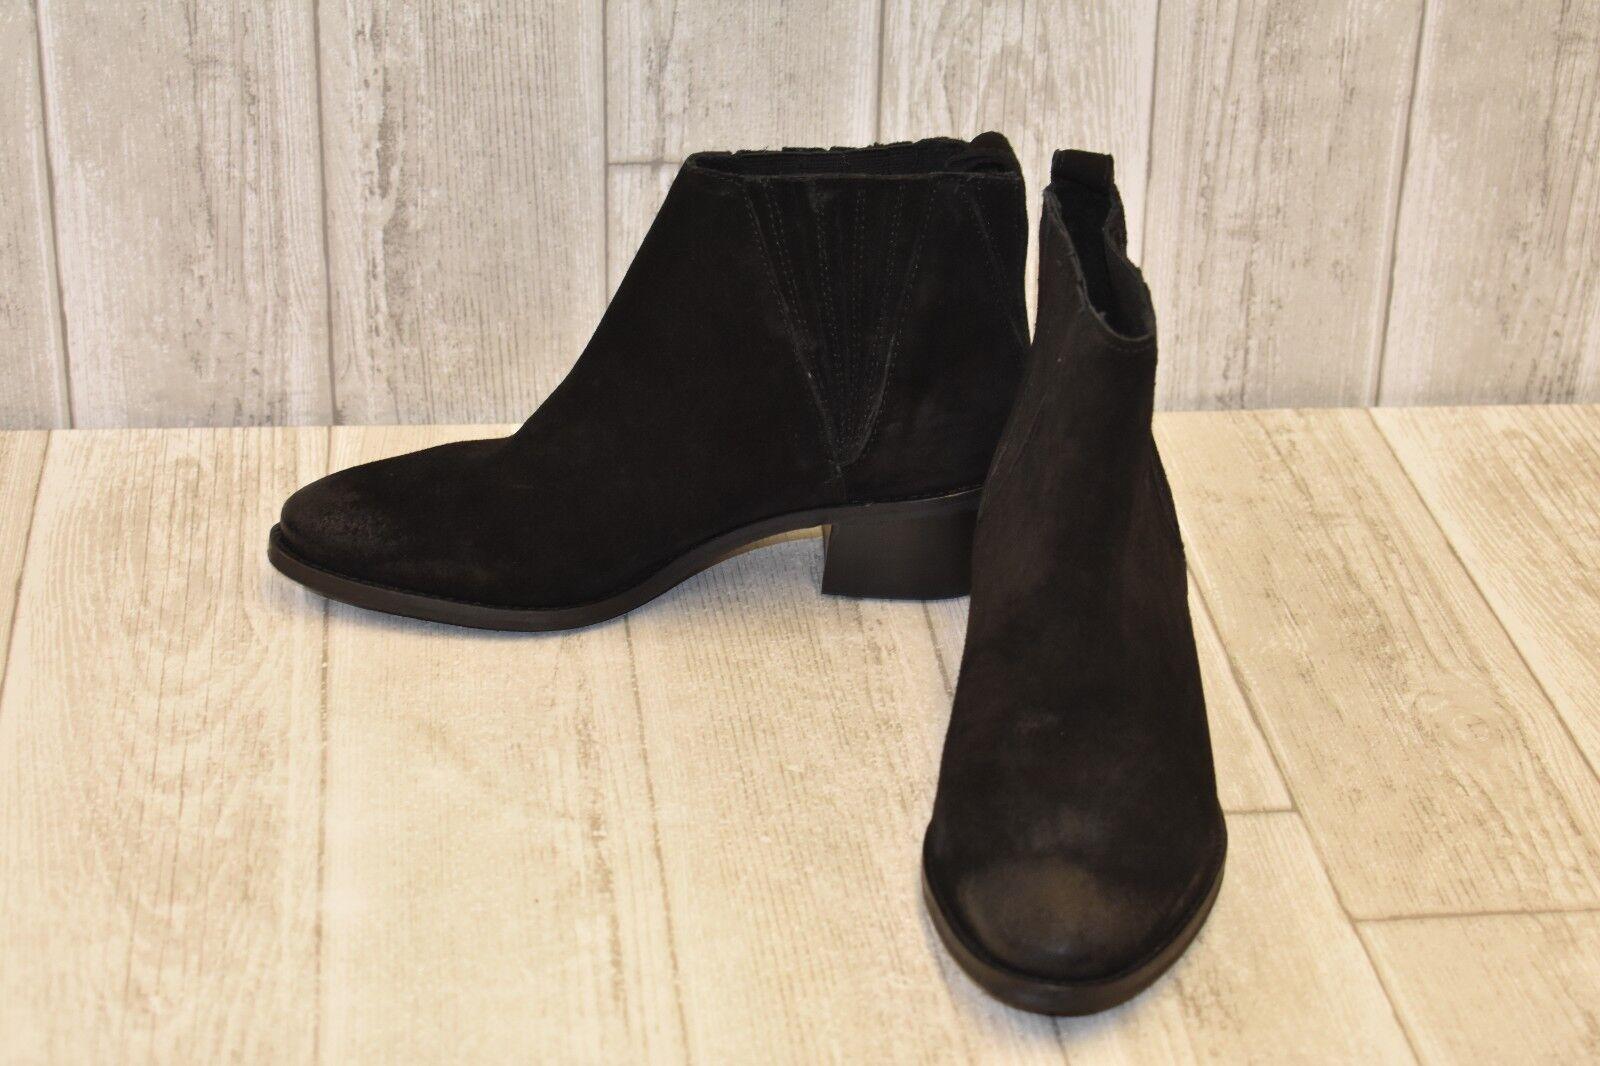 Splendid Cupid Distressed Suede Booties, Women's Size 8.5, Black NEW